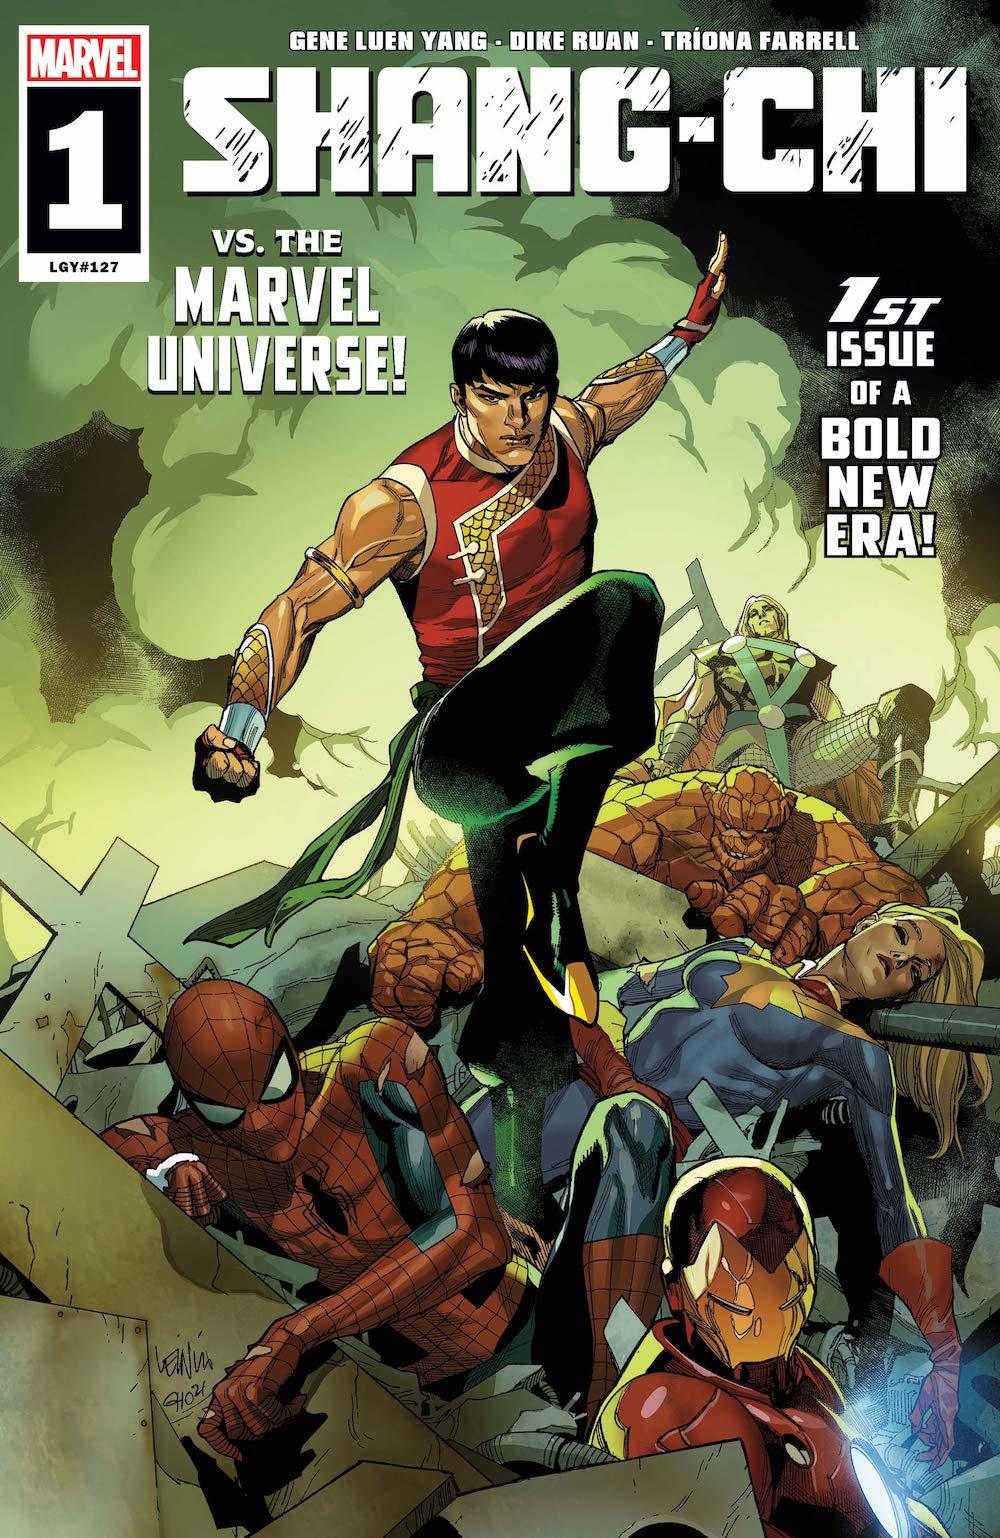 Shang-Chi #1 Cover by Leinil Francis Yu